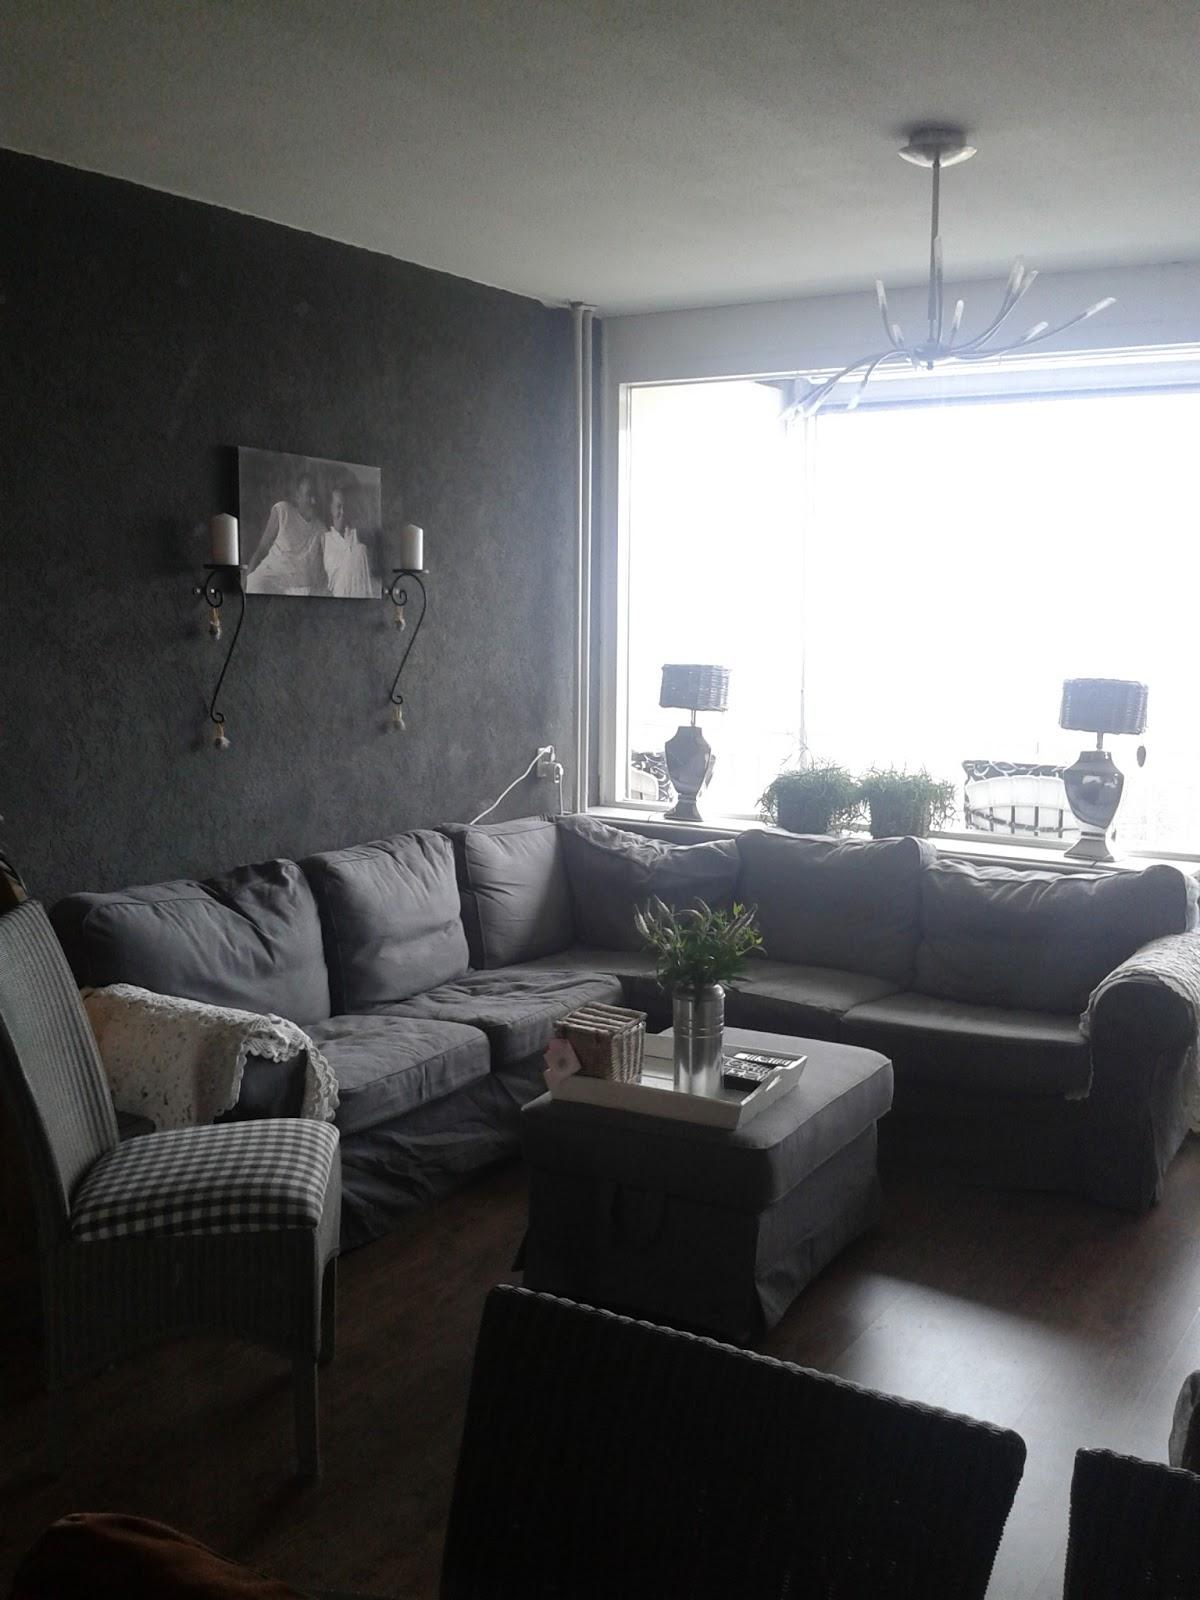 Ektorp Hoekbank Grijs Ikea.Notti S Life Huiskamer